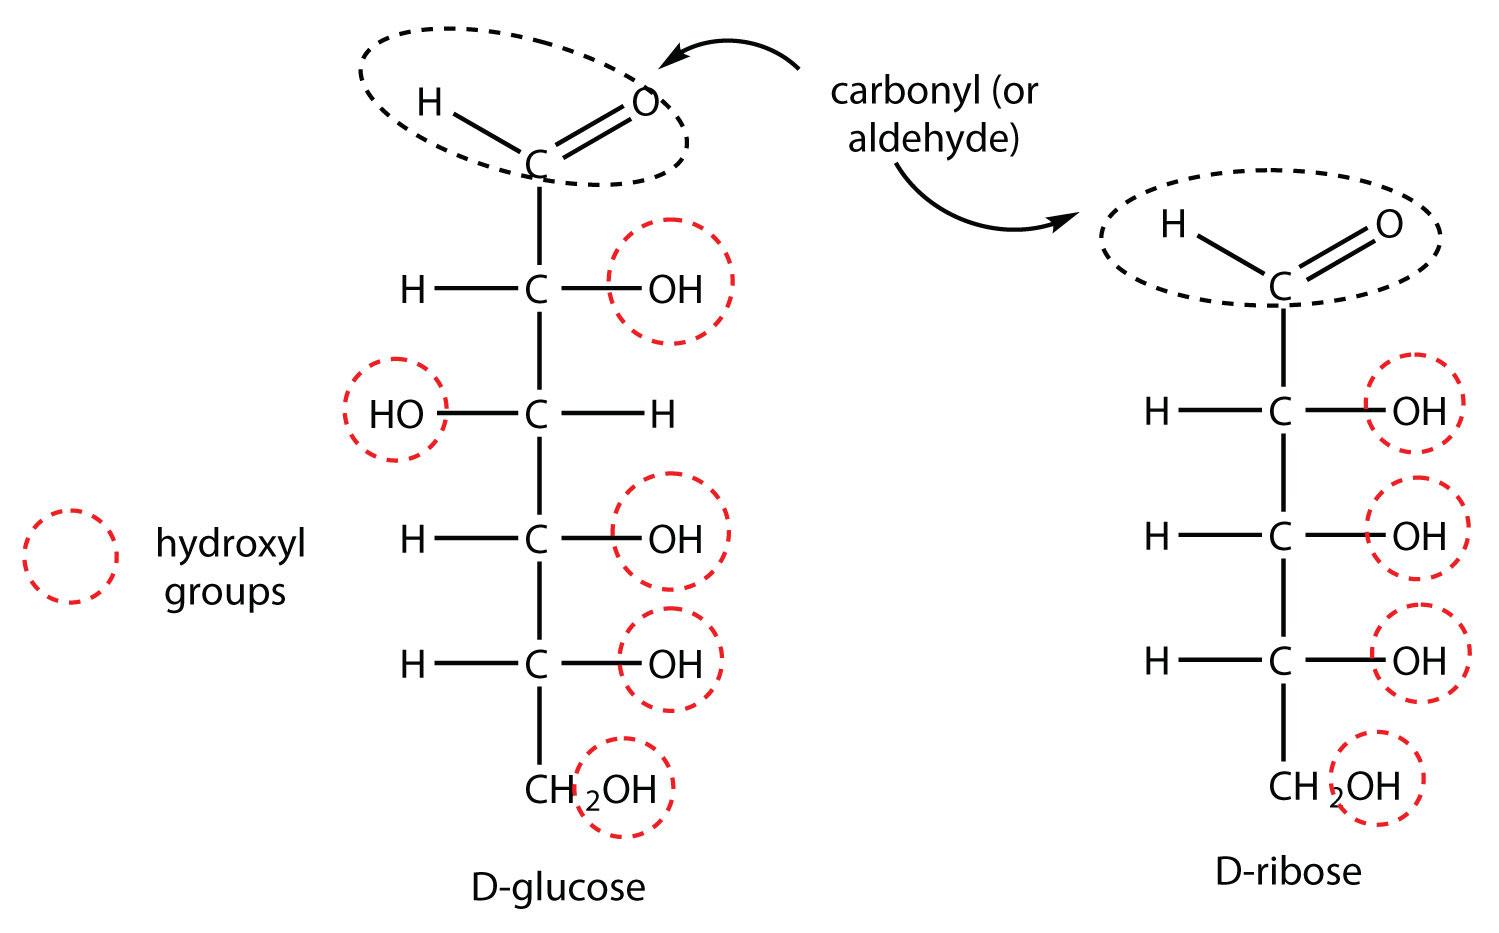 Alpha D Galactose Fischer Projection Lactose  D-ribose